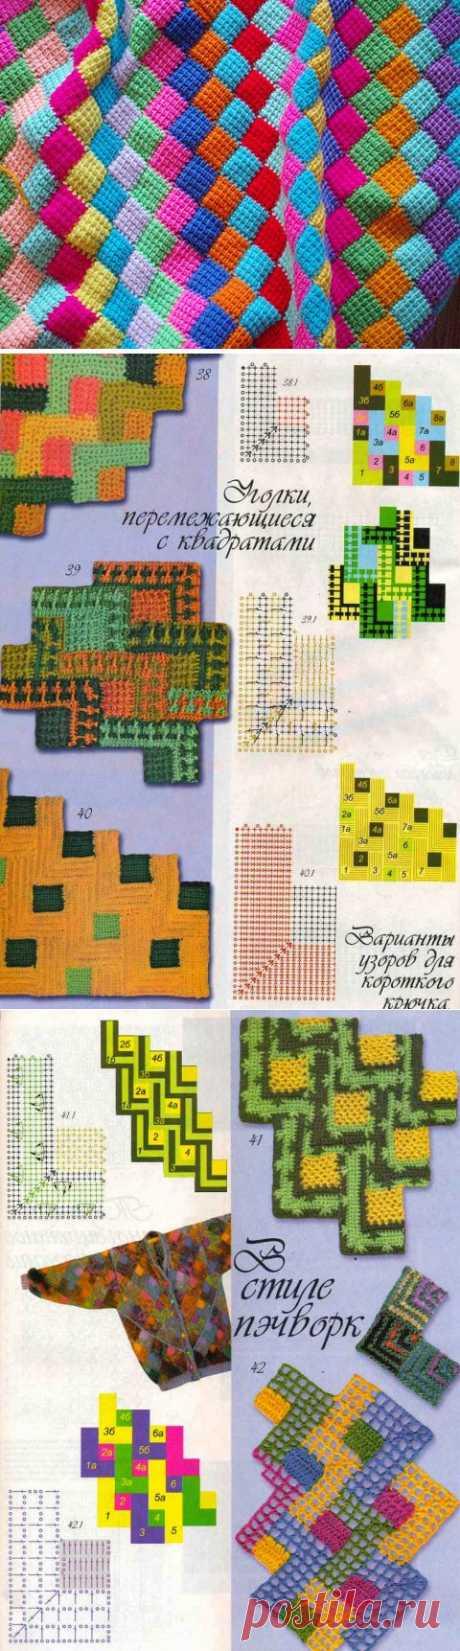 Вязание для дома - вязание крючком на kru4ok.ru